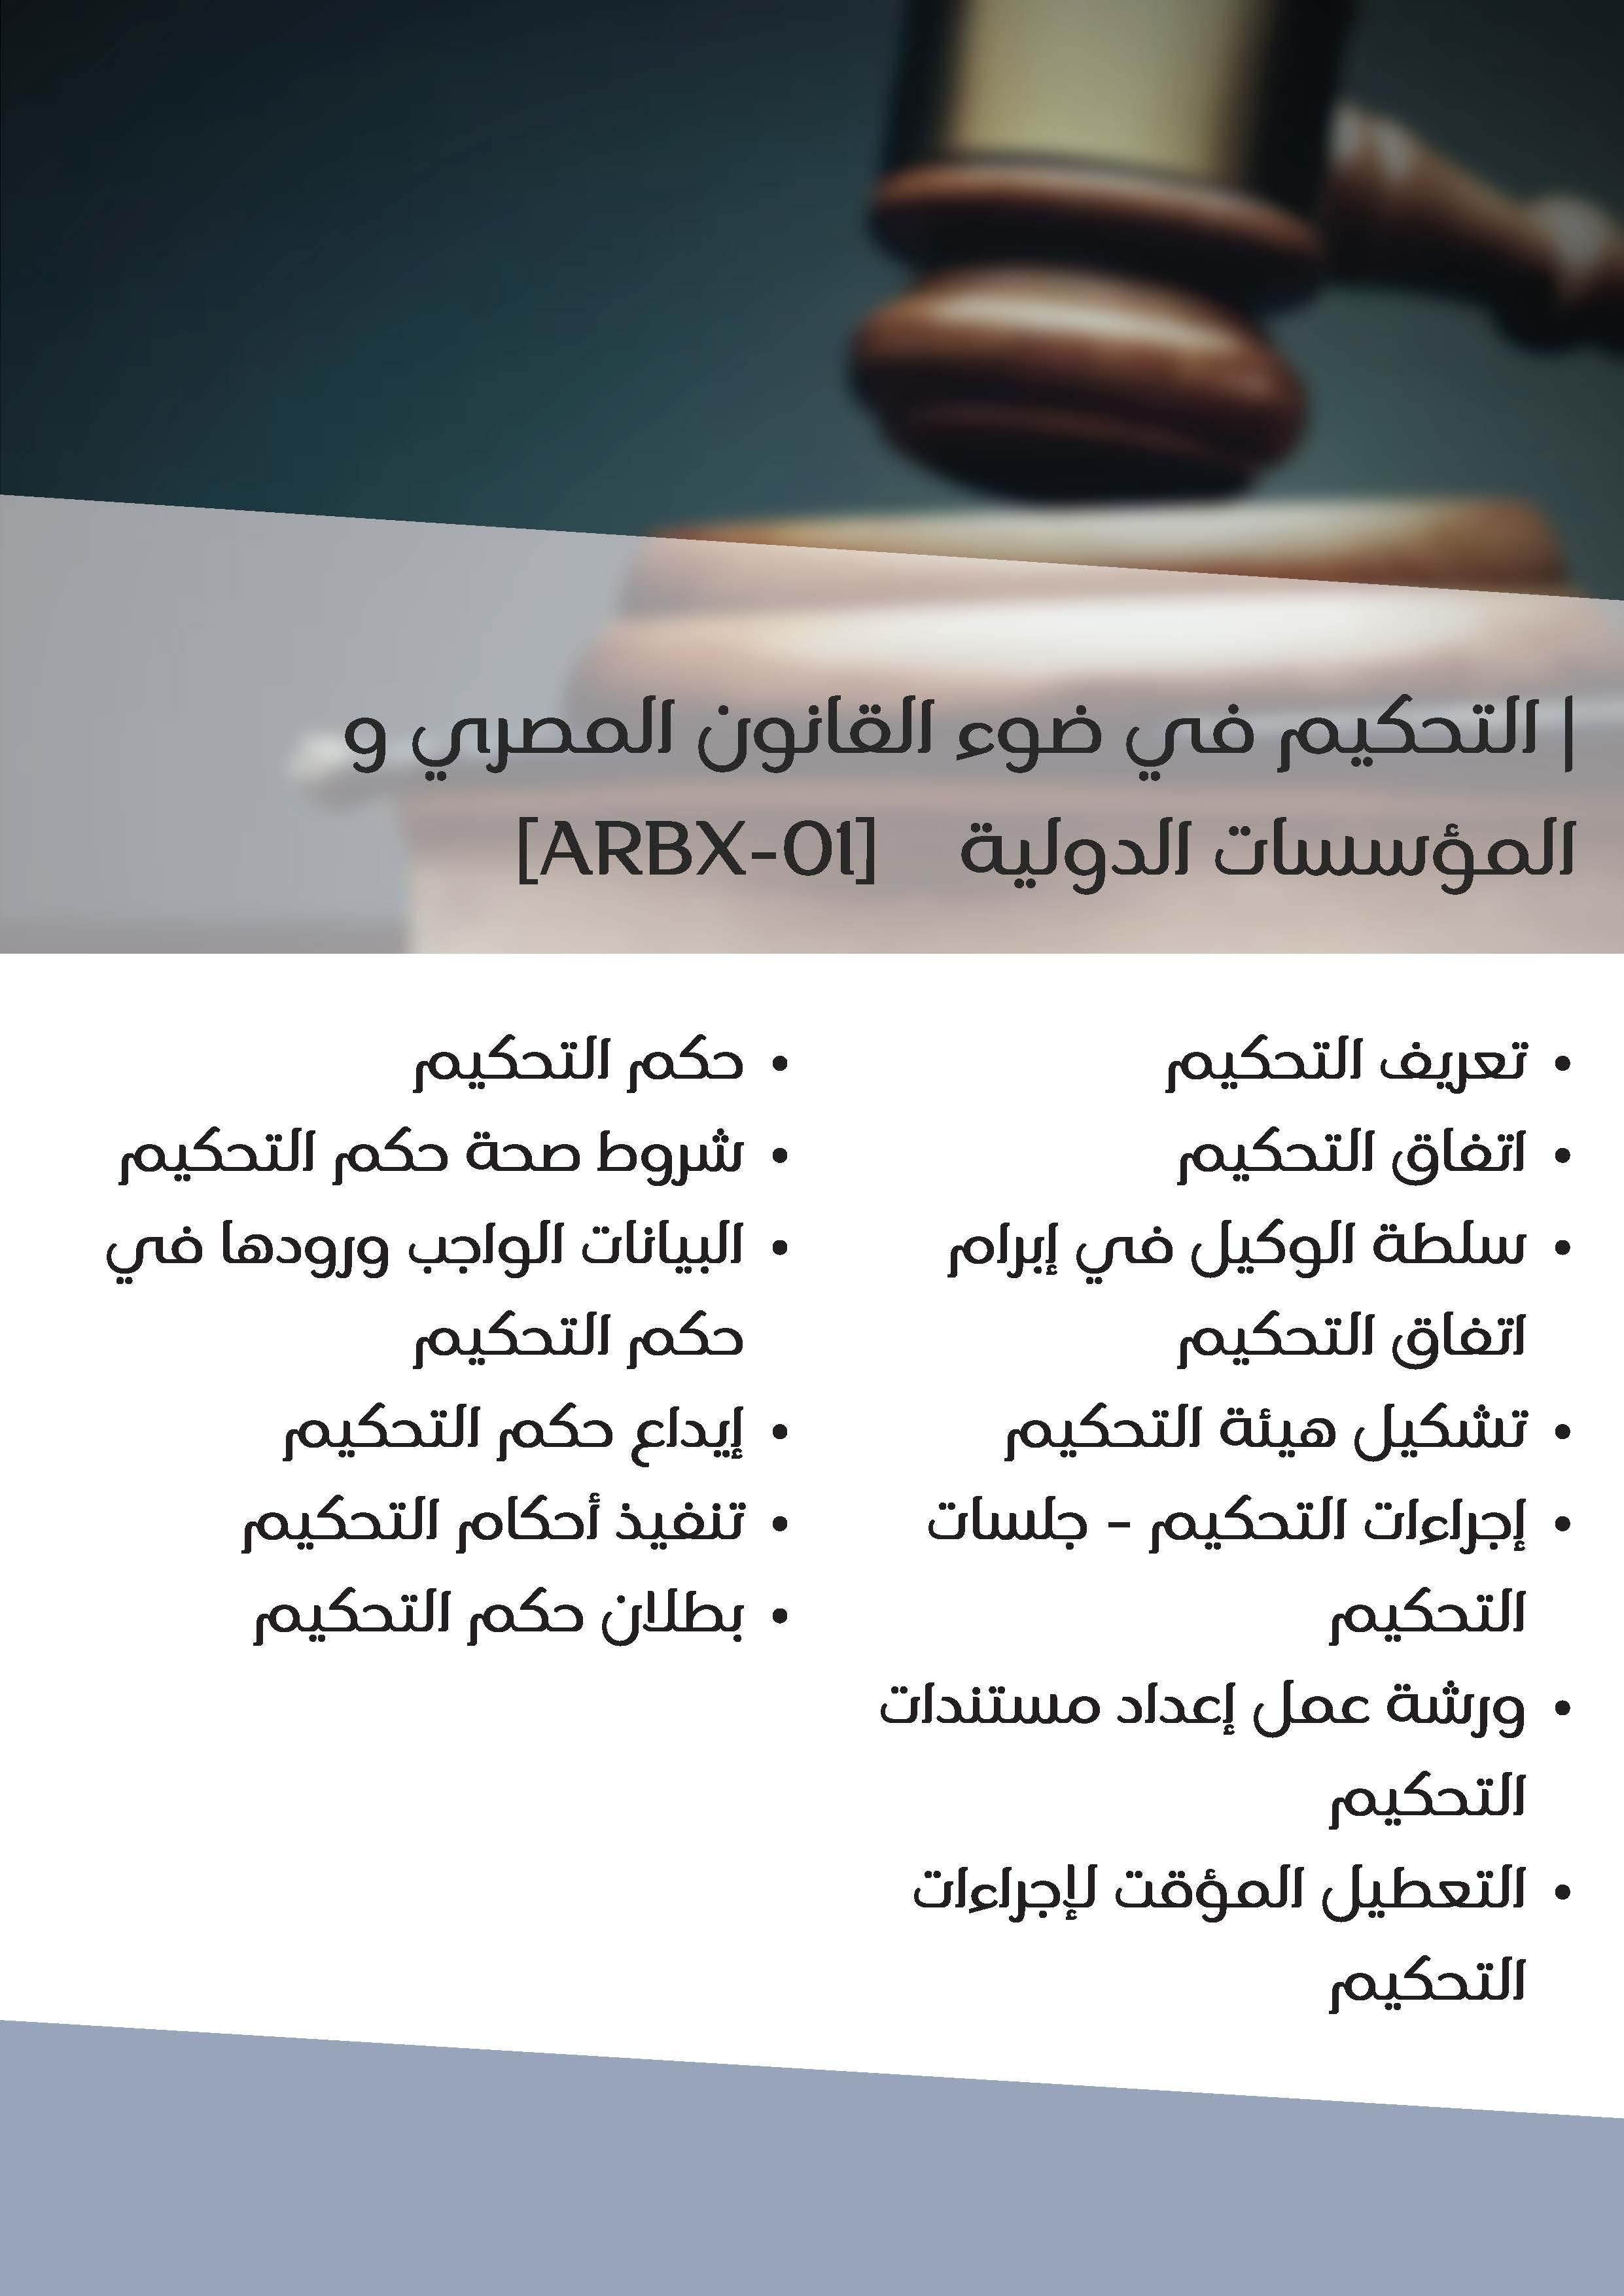 ARBX 01التحكيم في ضوء القانون المصري والمؤسسات الدولية